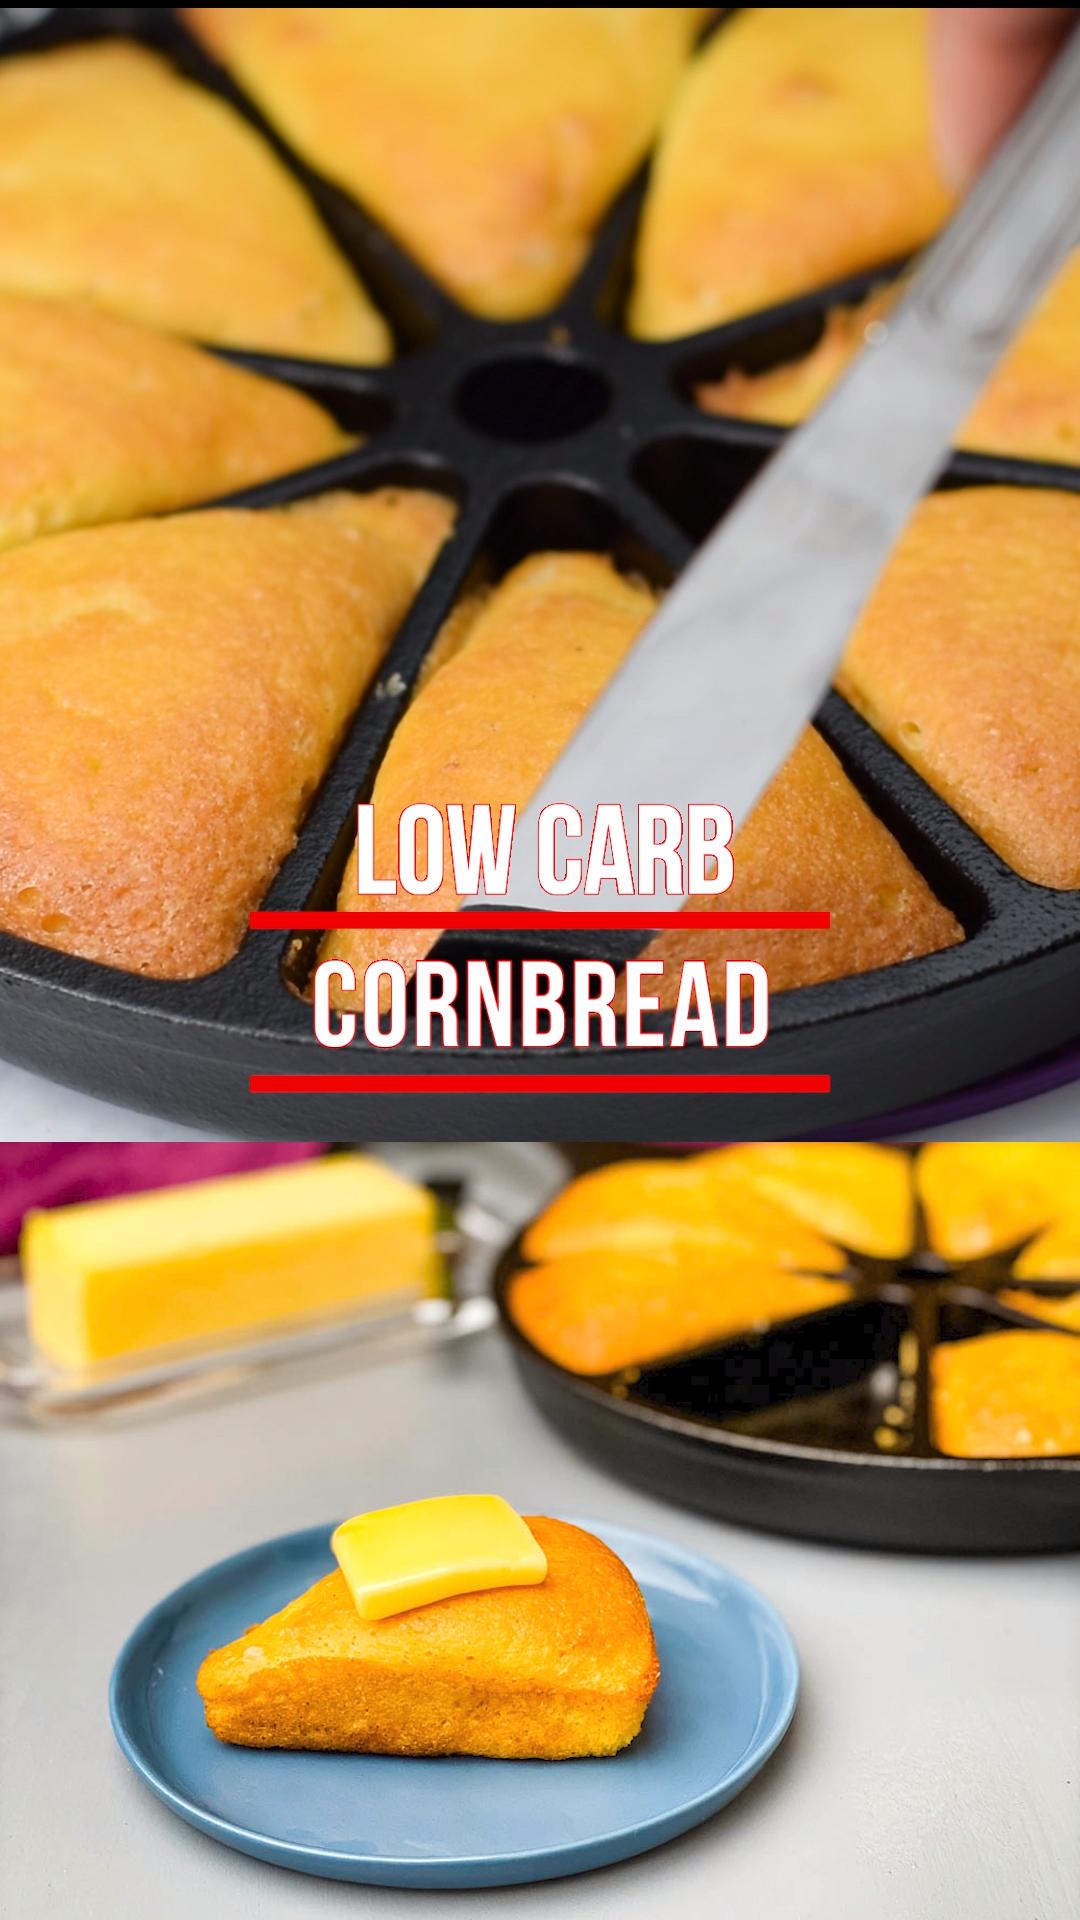 Easy Keto Low-Carb Cornbread